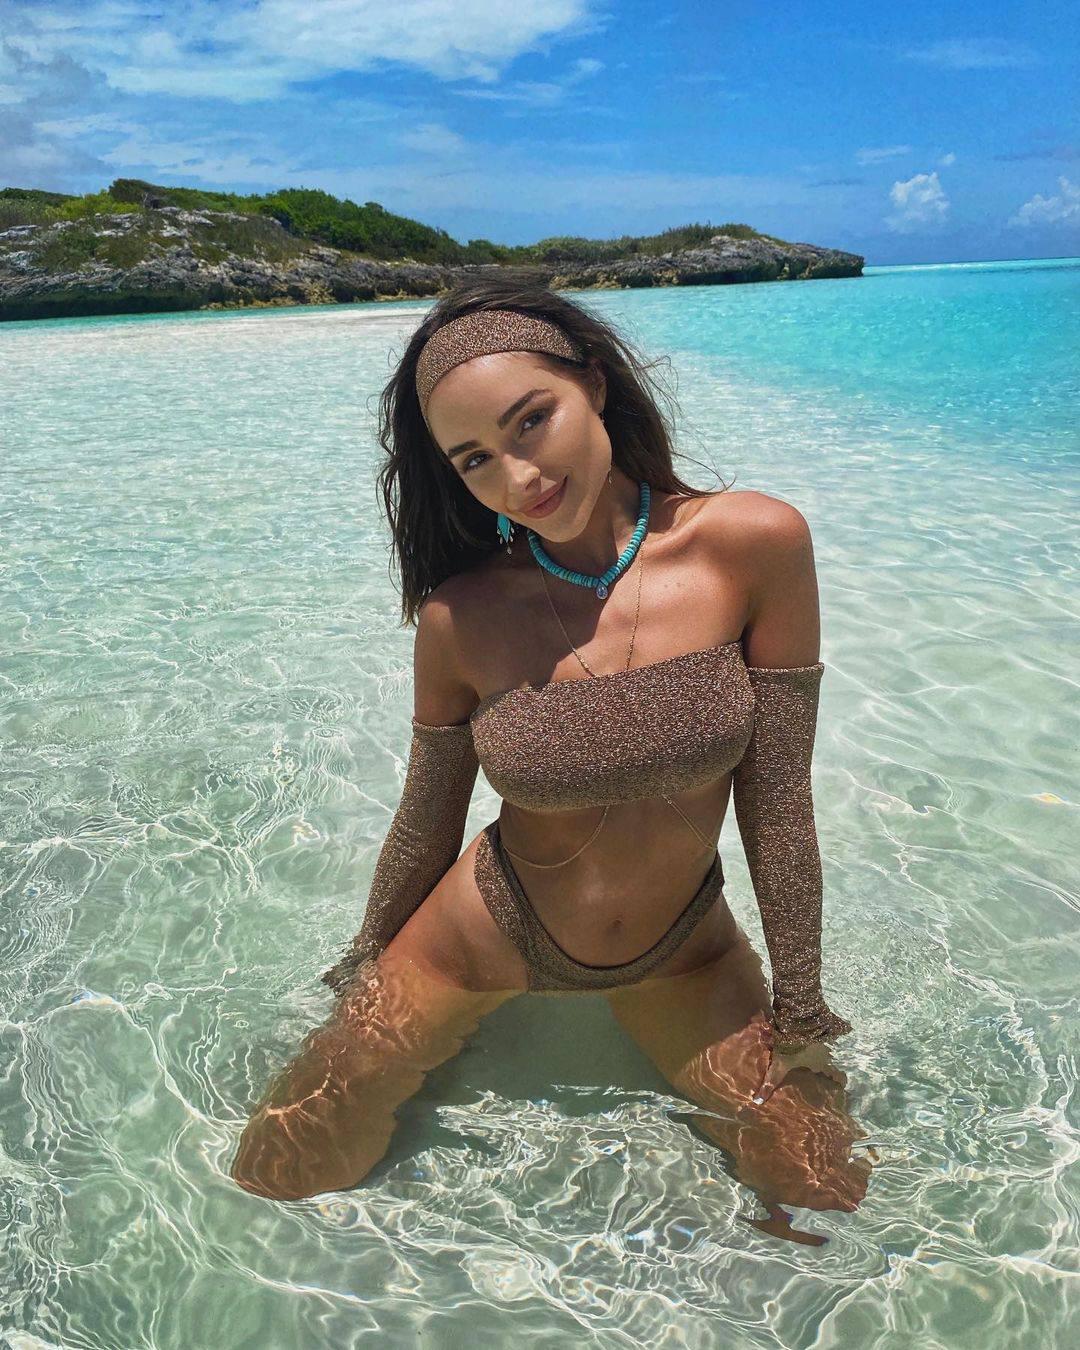 Olivia Culpo Hot In Bikini